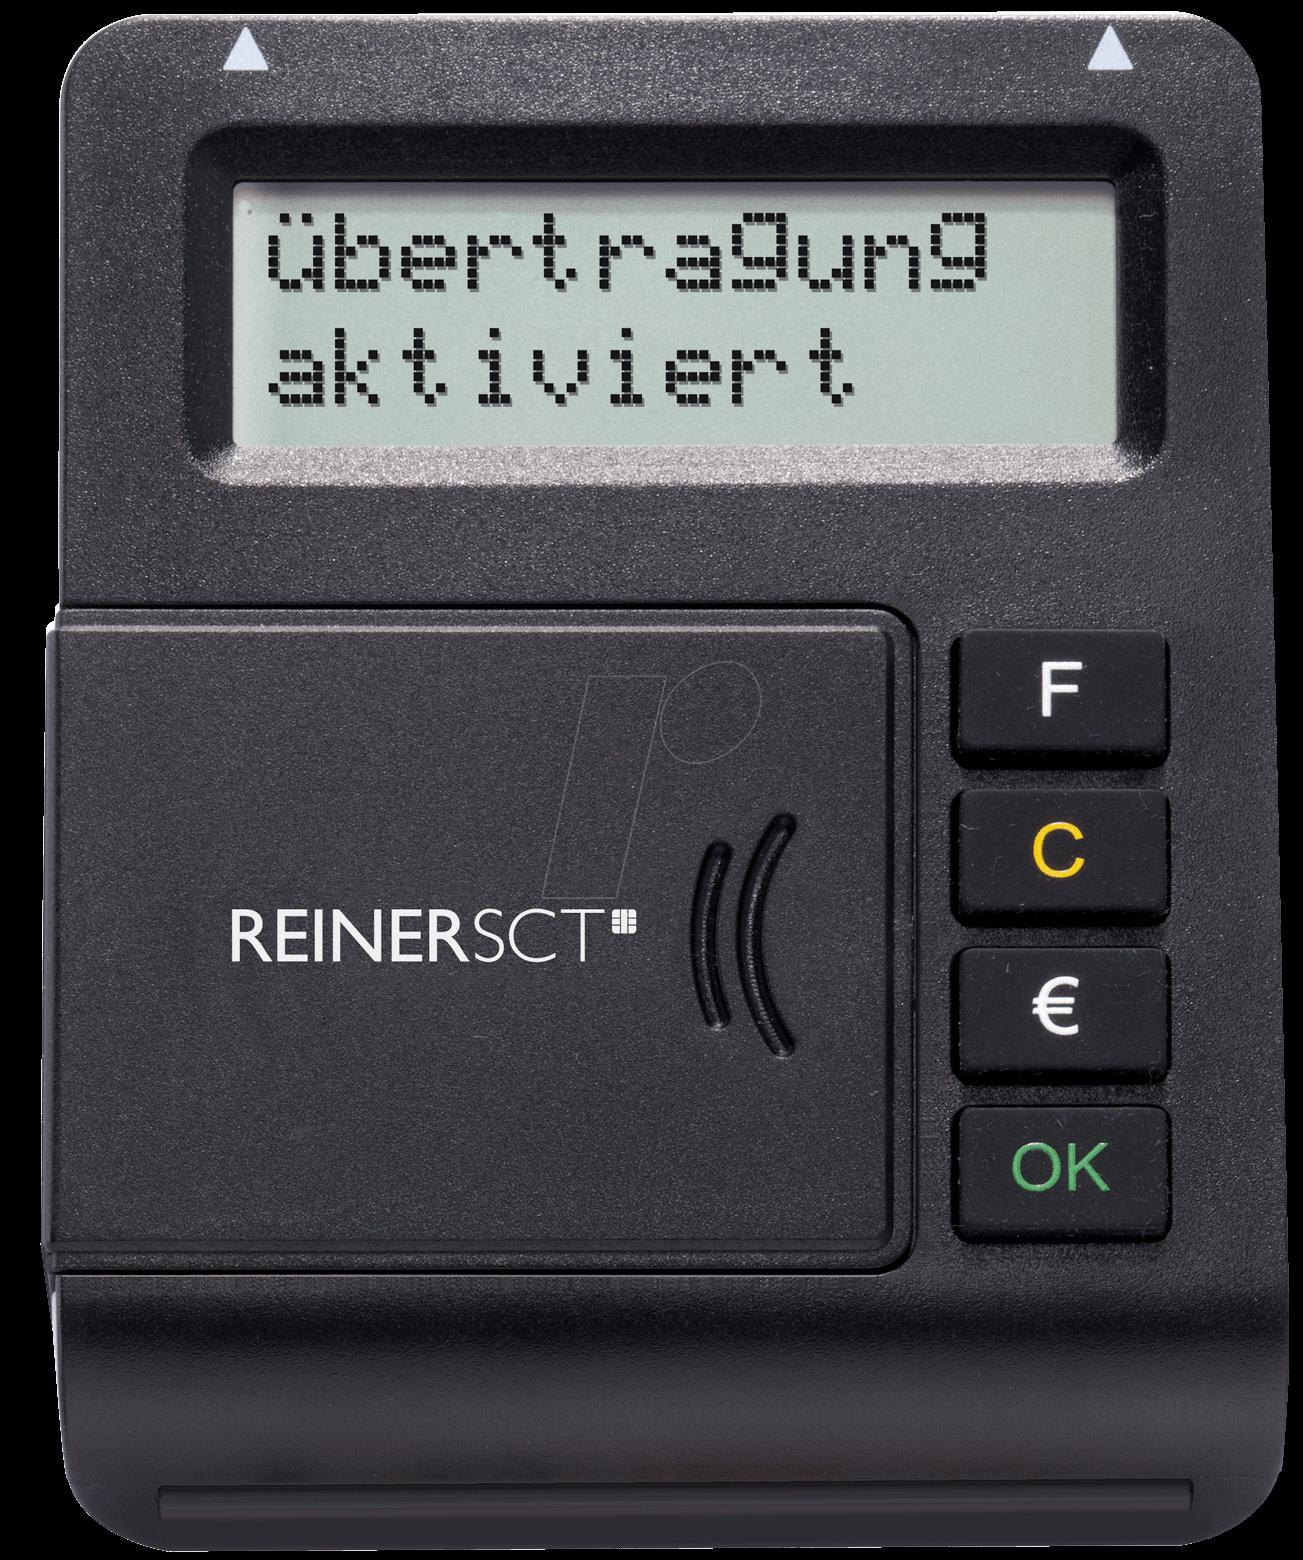 https://cdn-reichelt.de/bilder/web/xxl_ws/R800/RSCT_TANJACK_OPTIC_CX-FRONTAL.png